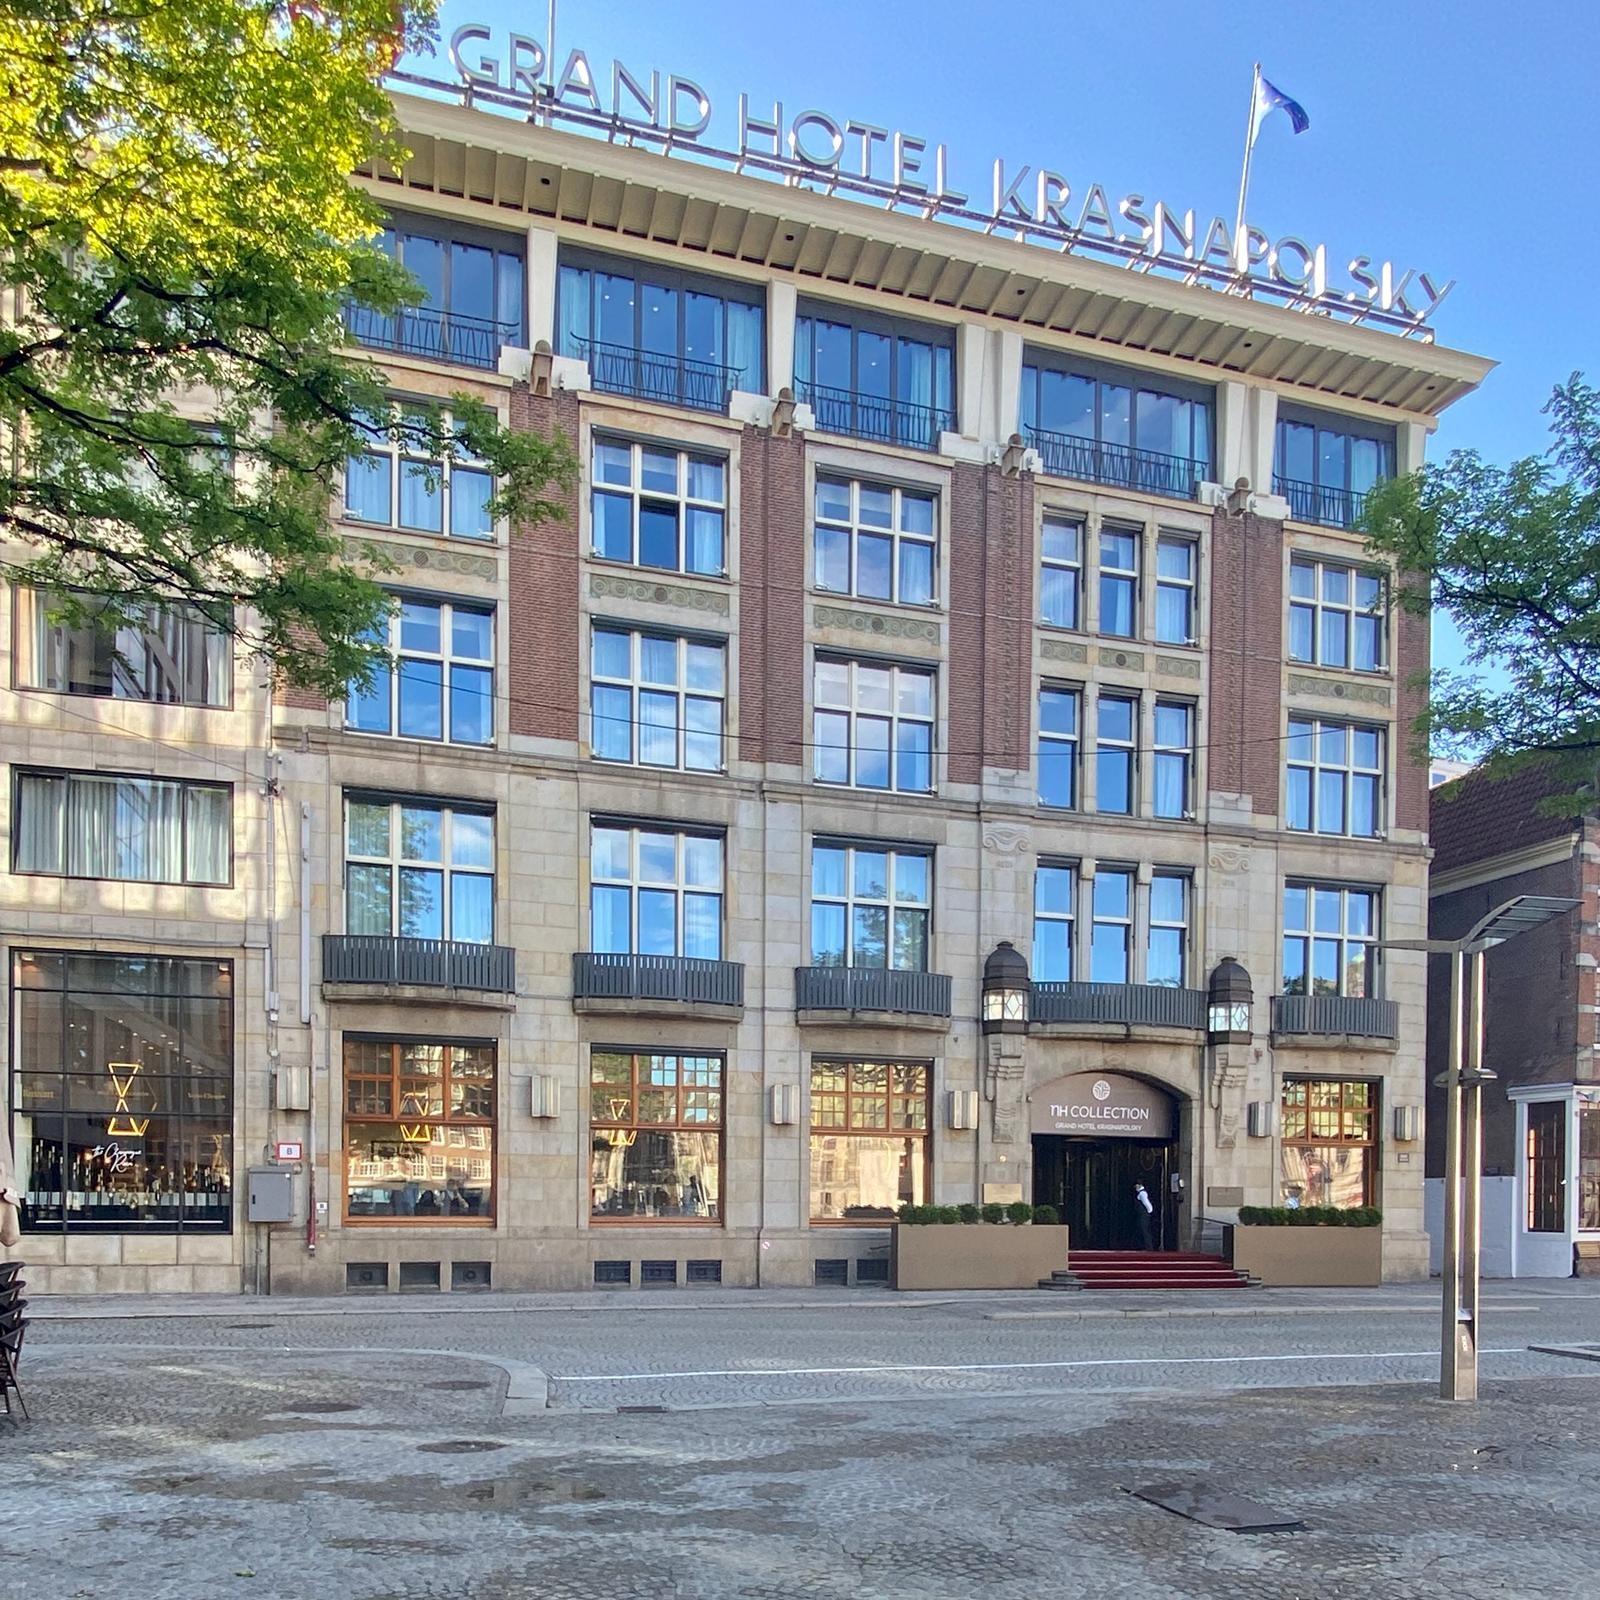 Nh Collection Grand Hotel Krasnapolsky Linkedin